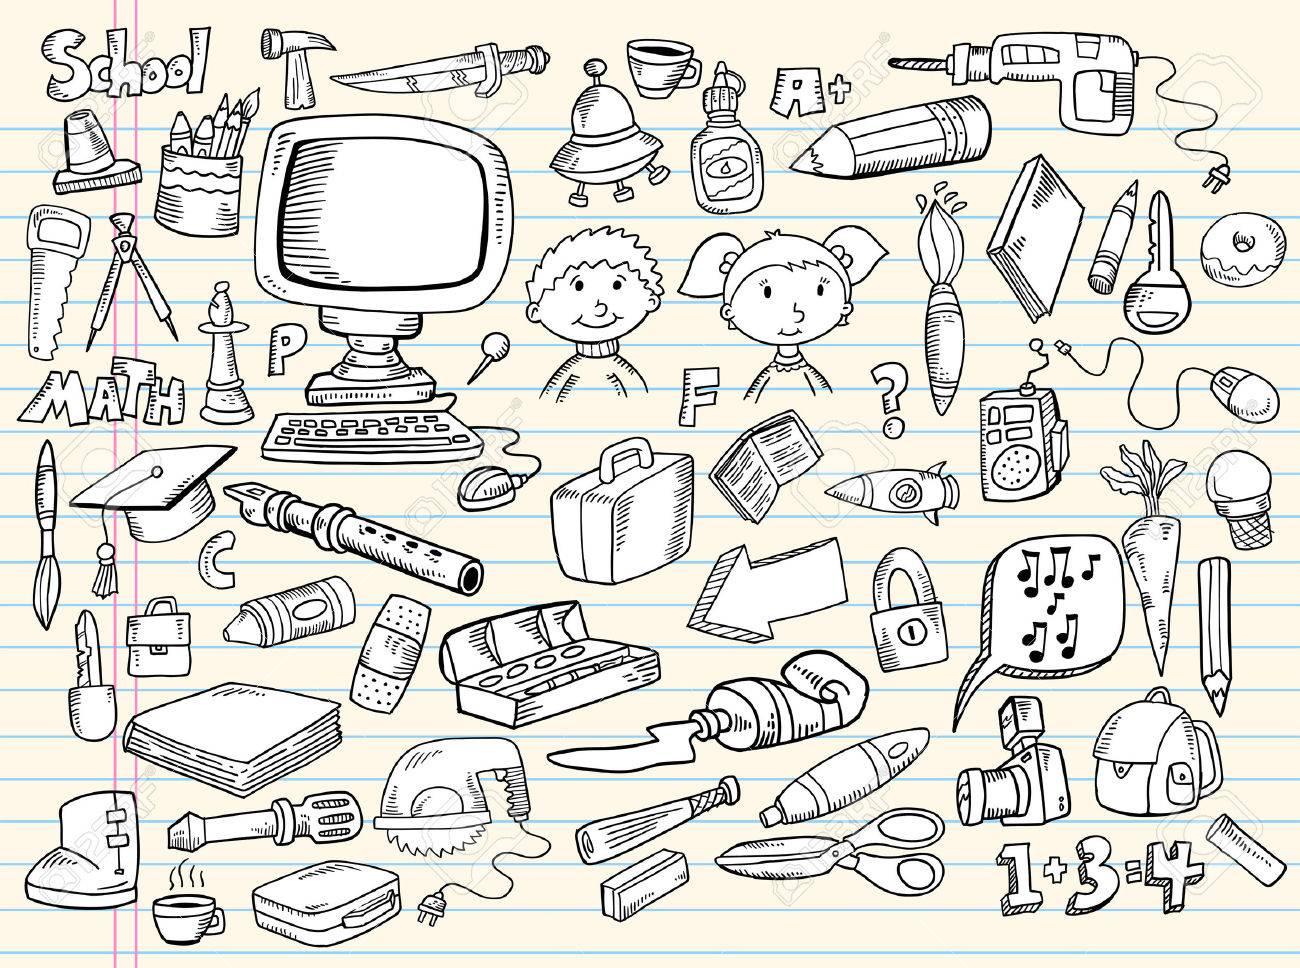 Notebook Doodle Speech Bubble Design Elements Mega Illustration Set - 7261105